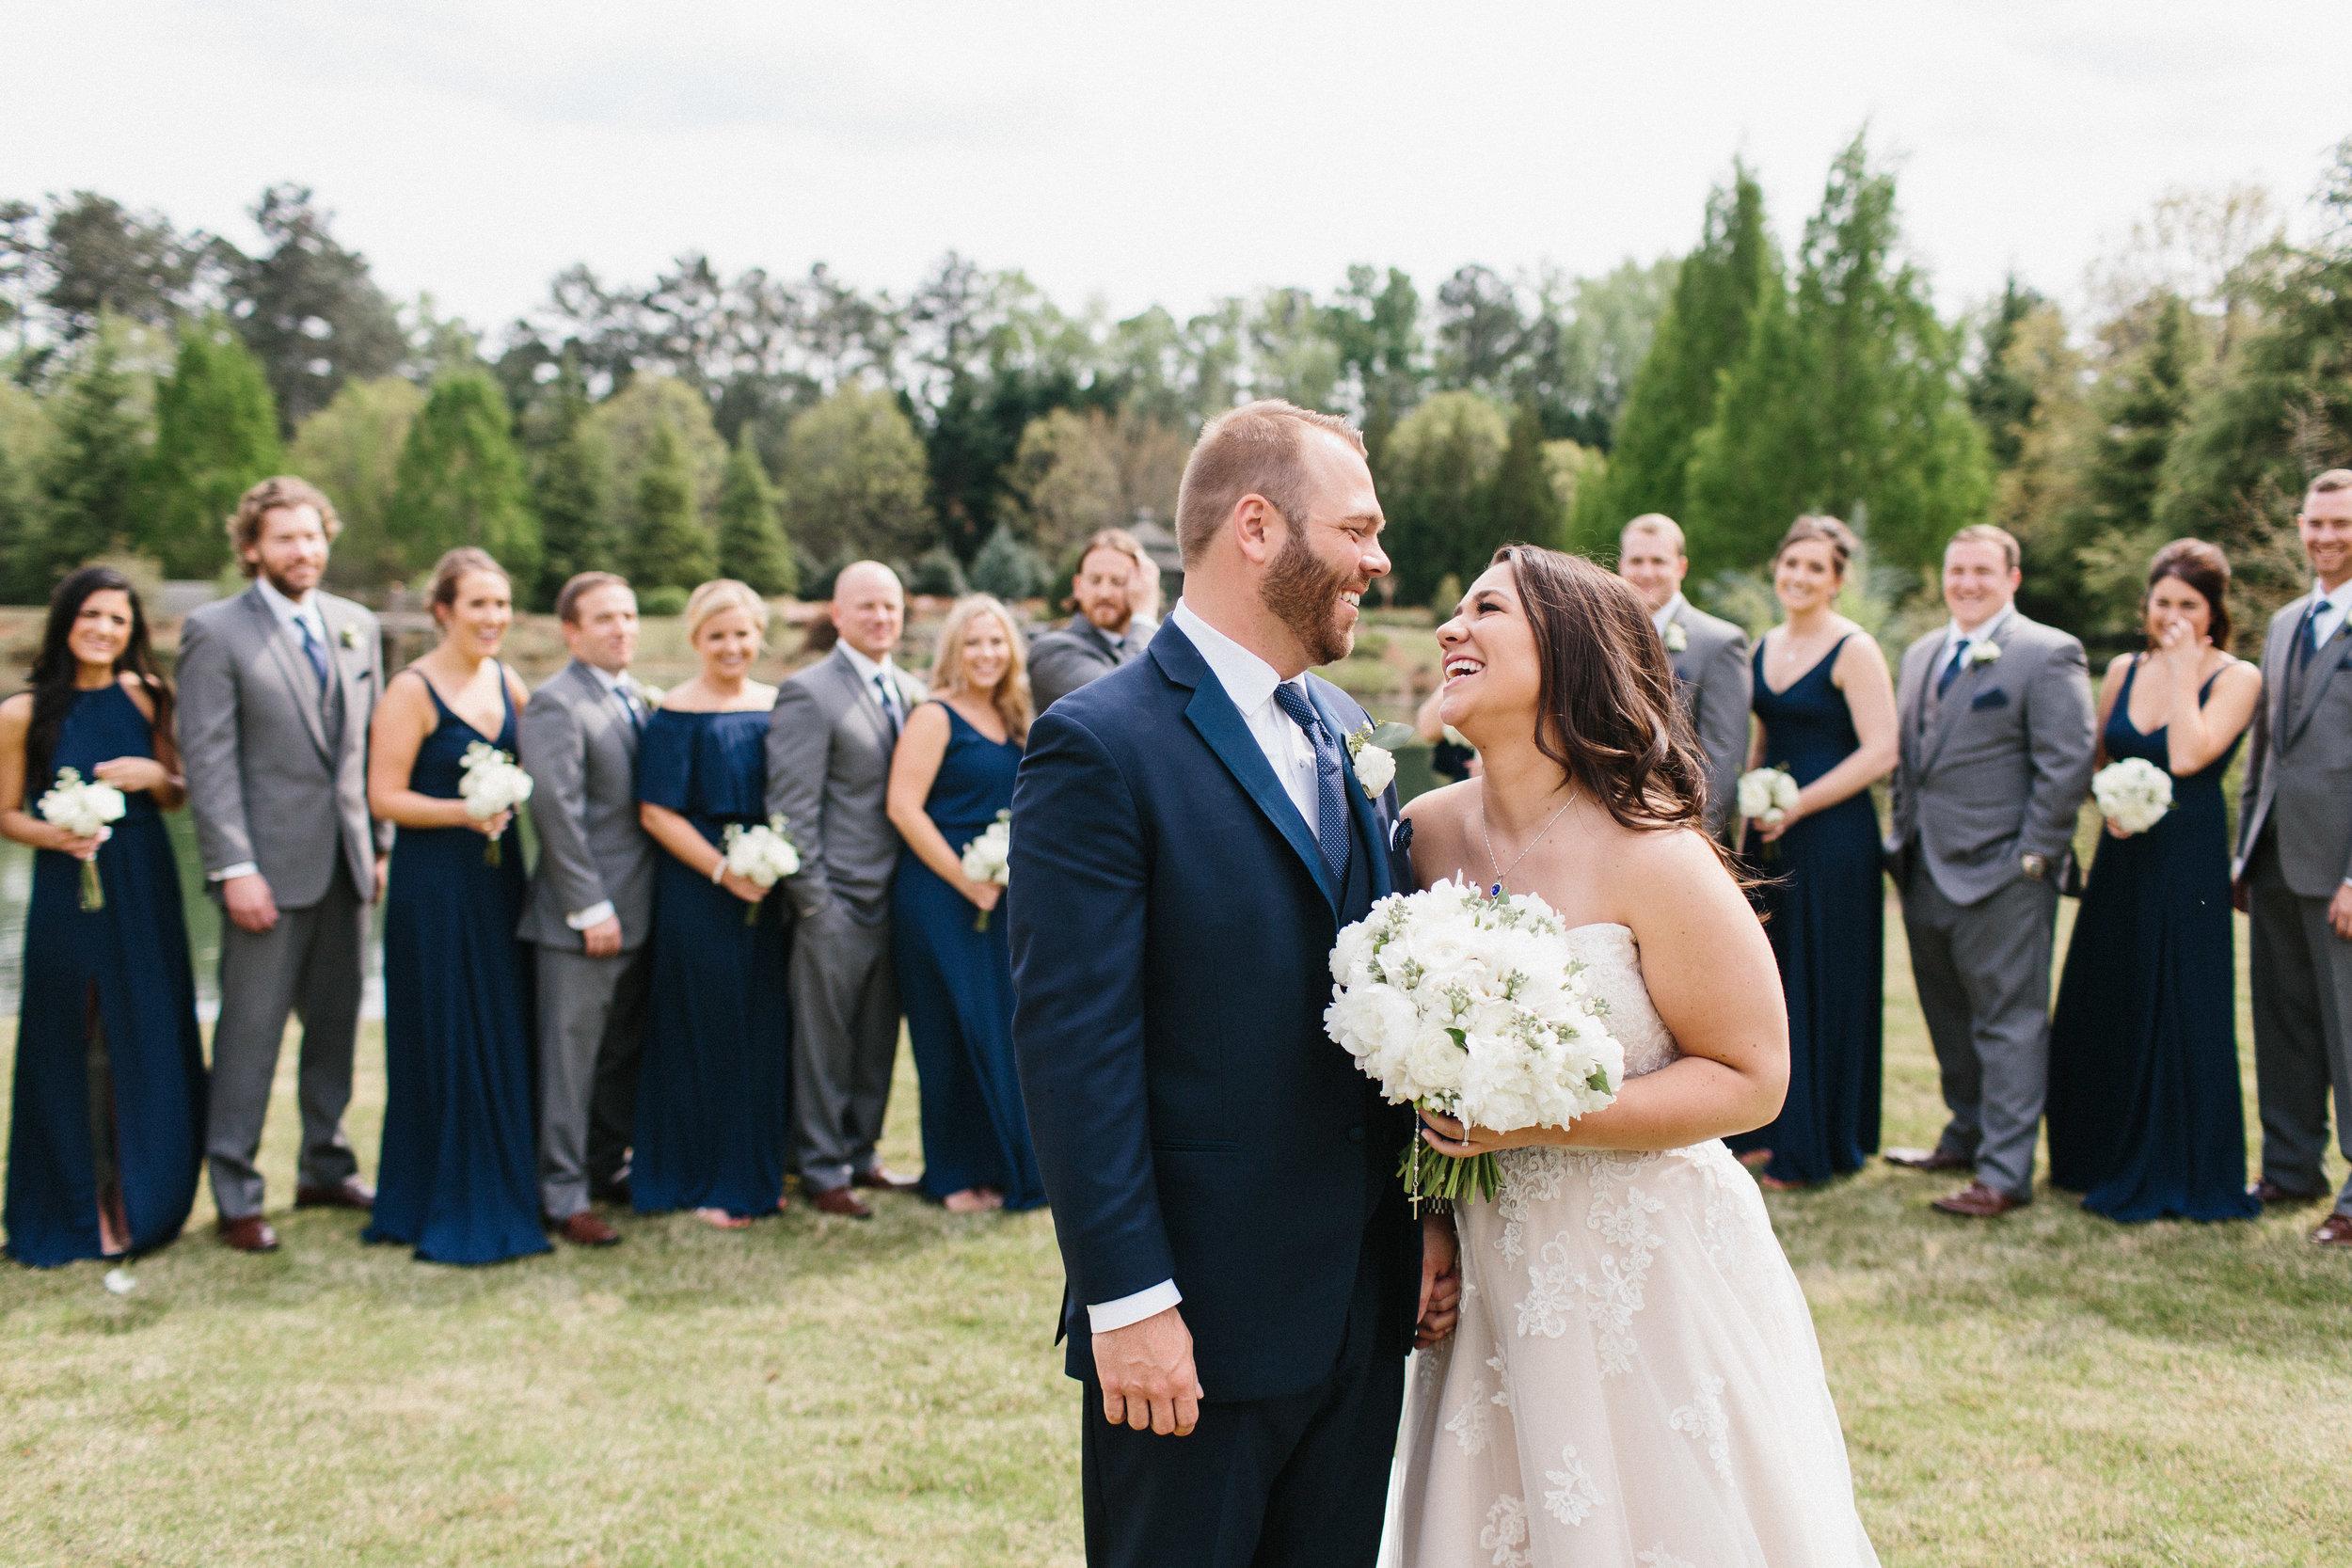 roswell_st_peter_chanel_catholic_avalon_hotel_alpharetta_wedding-1719.jpg